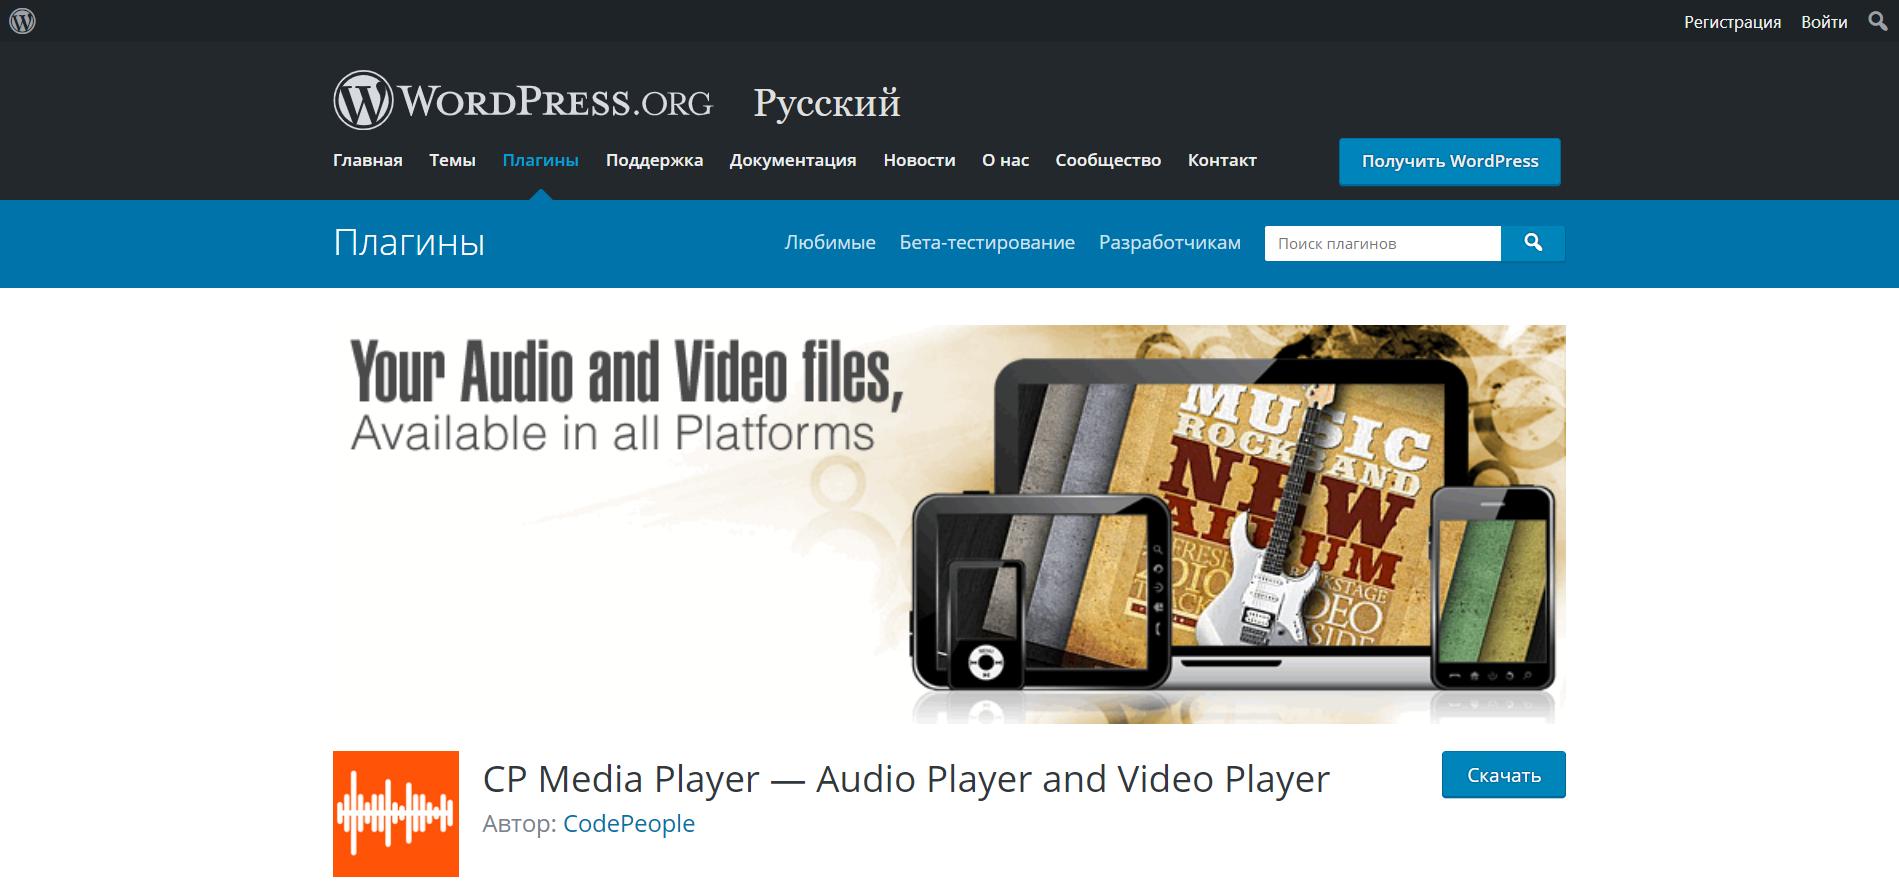 CP Media Player видеоплагин для WordPress